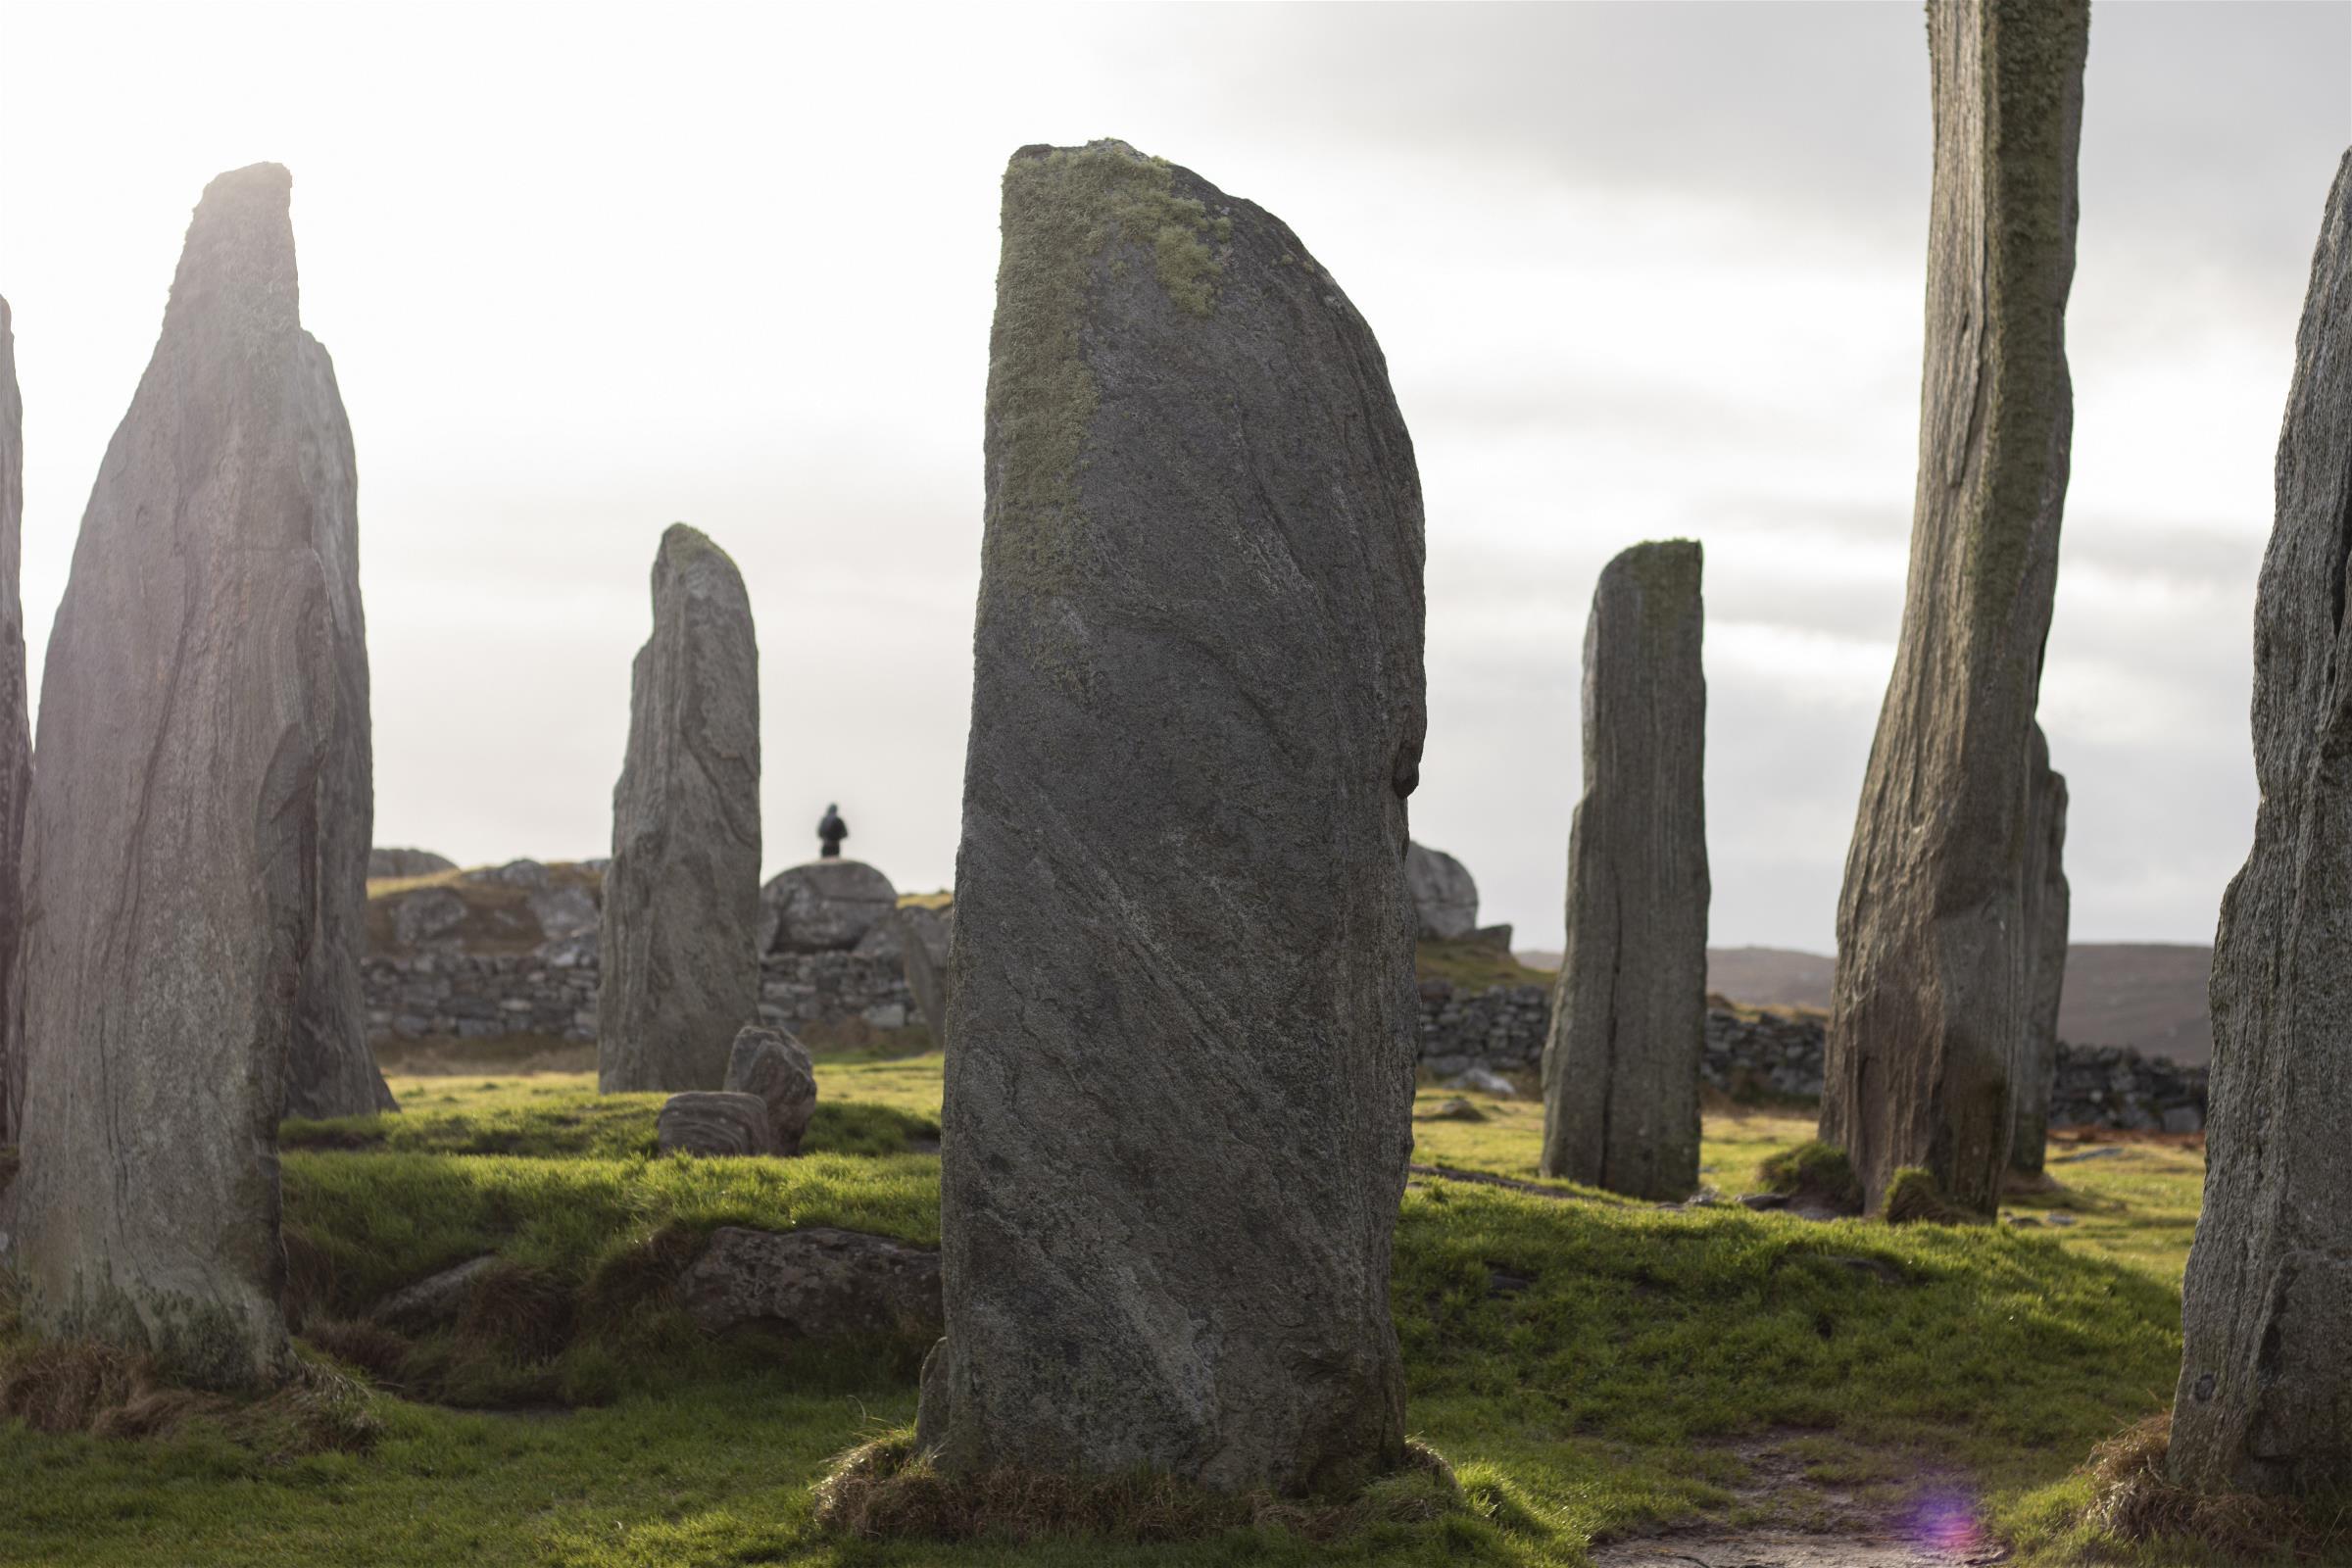 Hidden within the Standing Stones